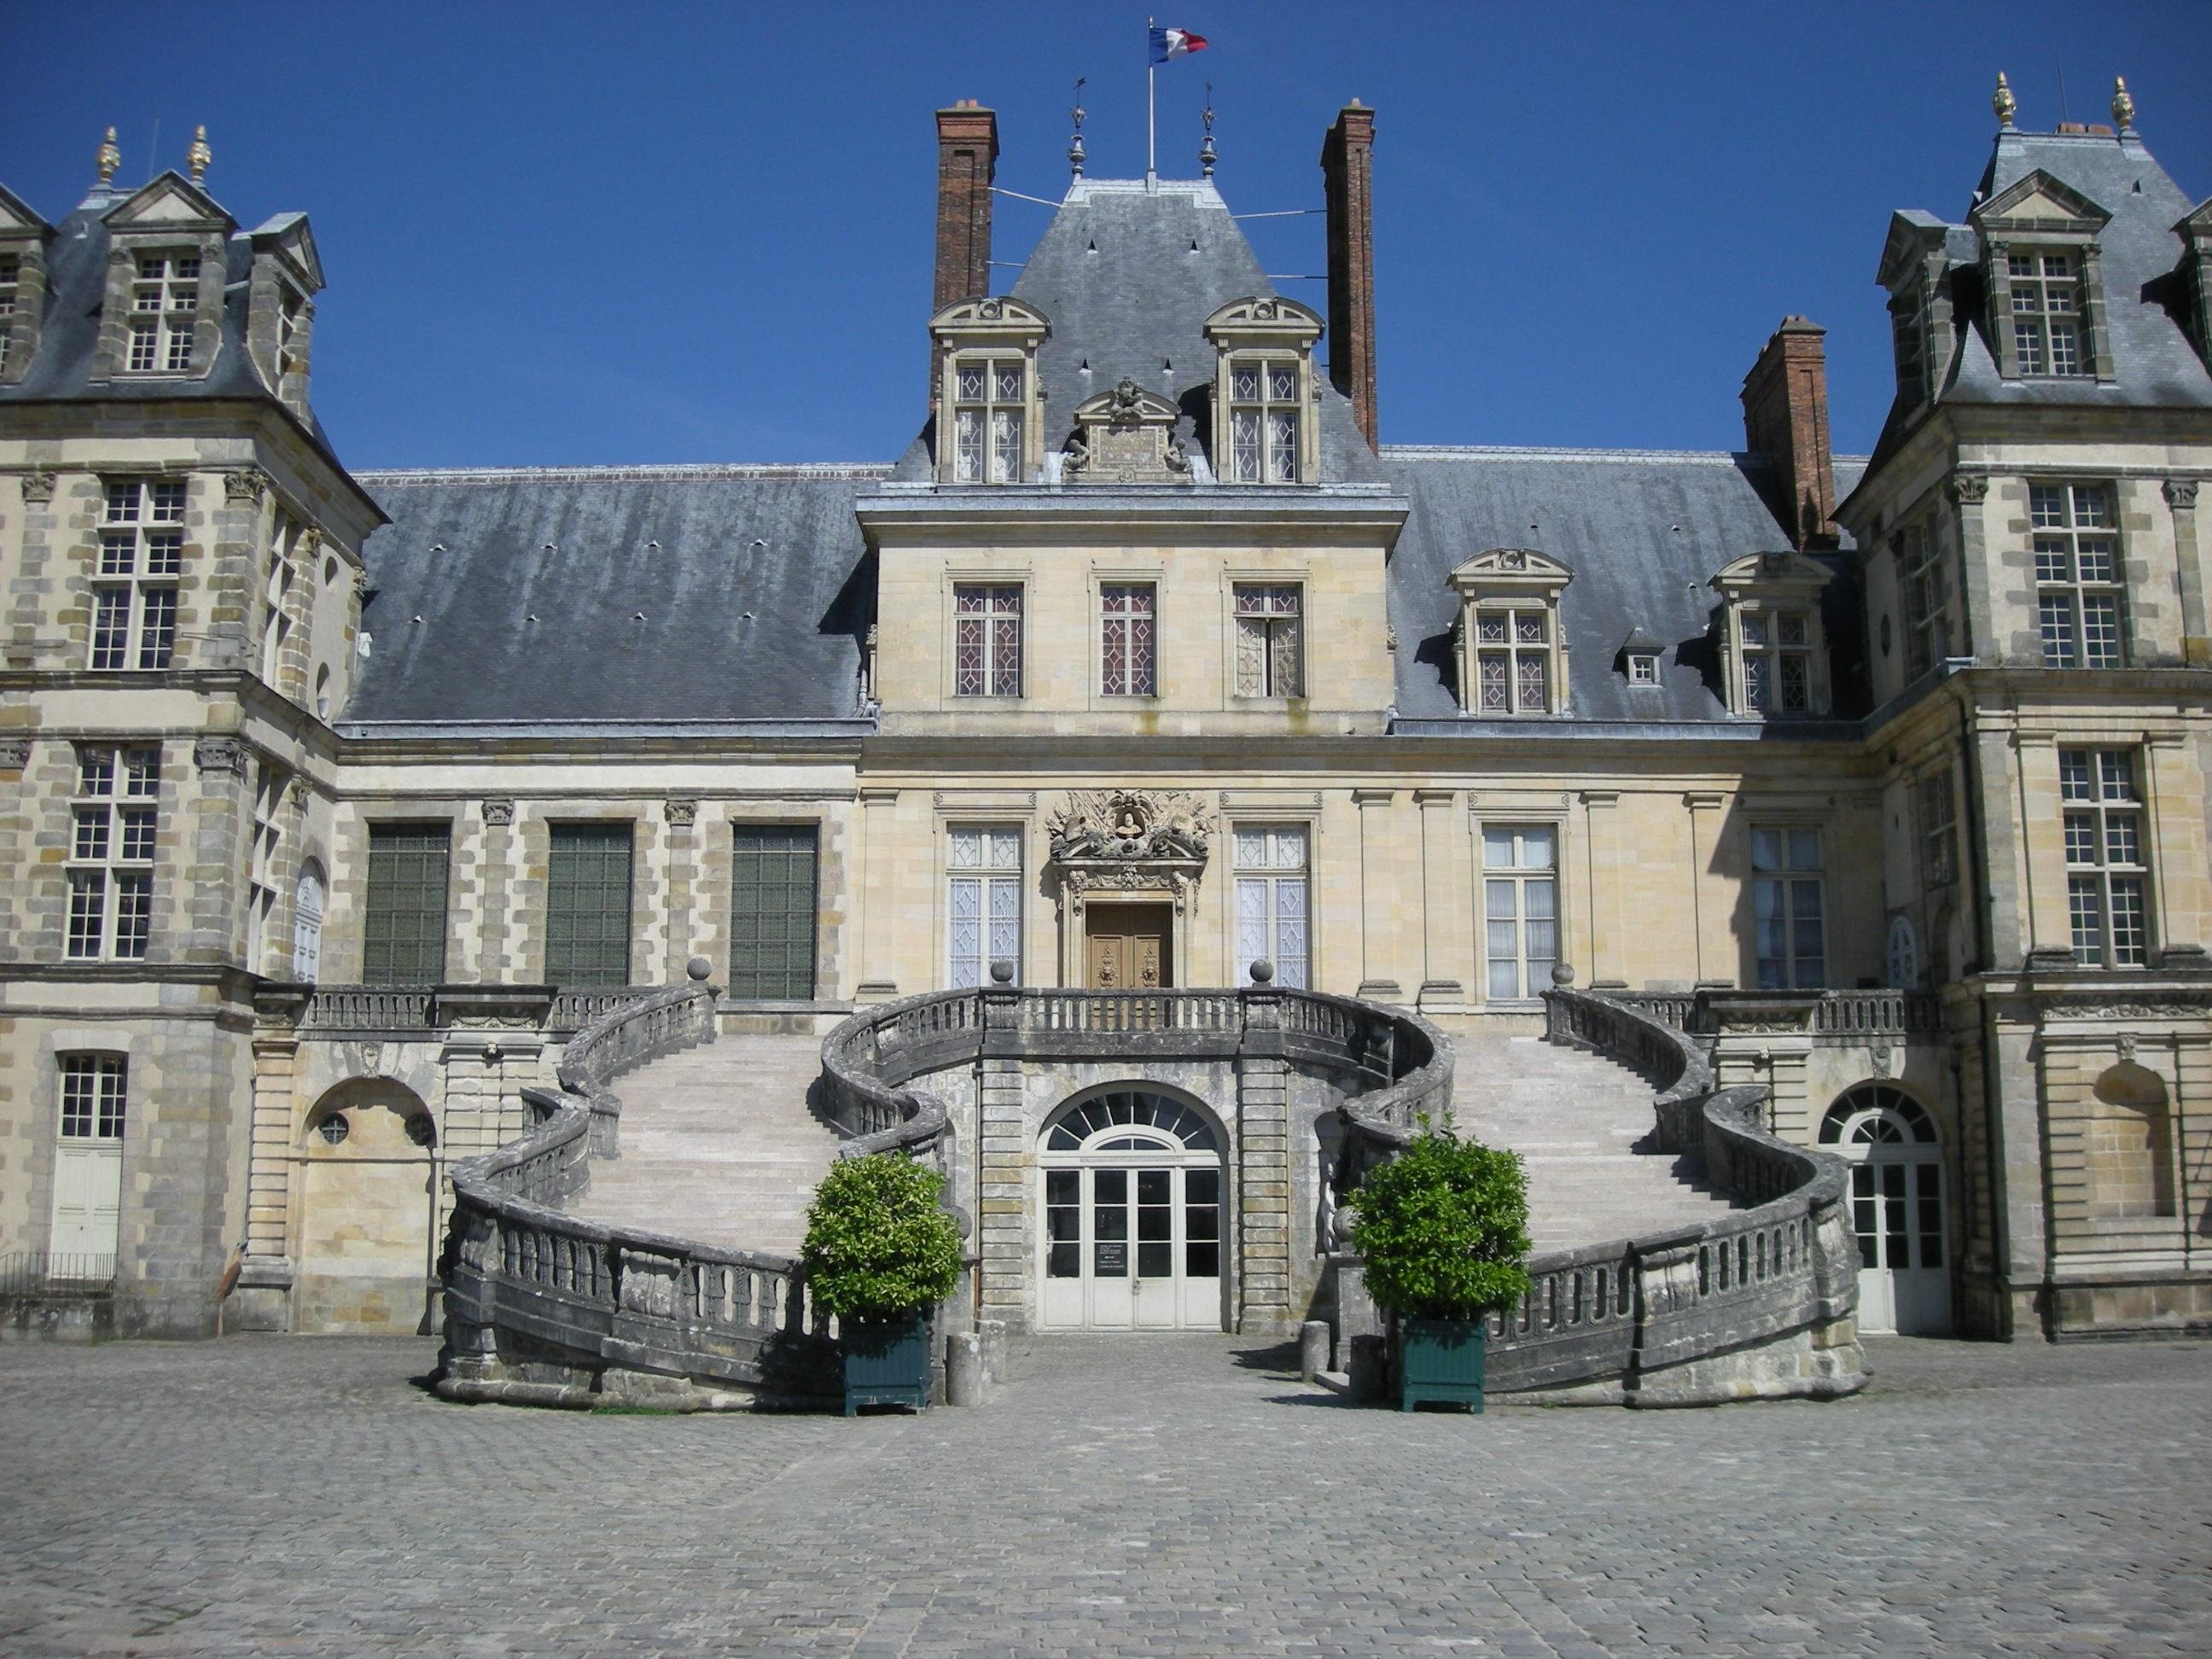 file fontainebleau castle 2735351636 jpg wikimedia commons. Black Bedroom Furniture Sets. Home Design Ideas